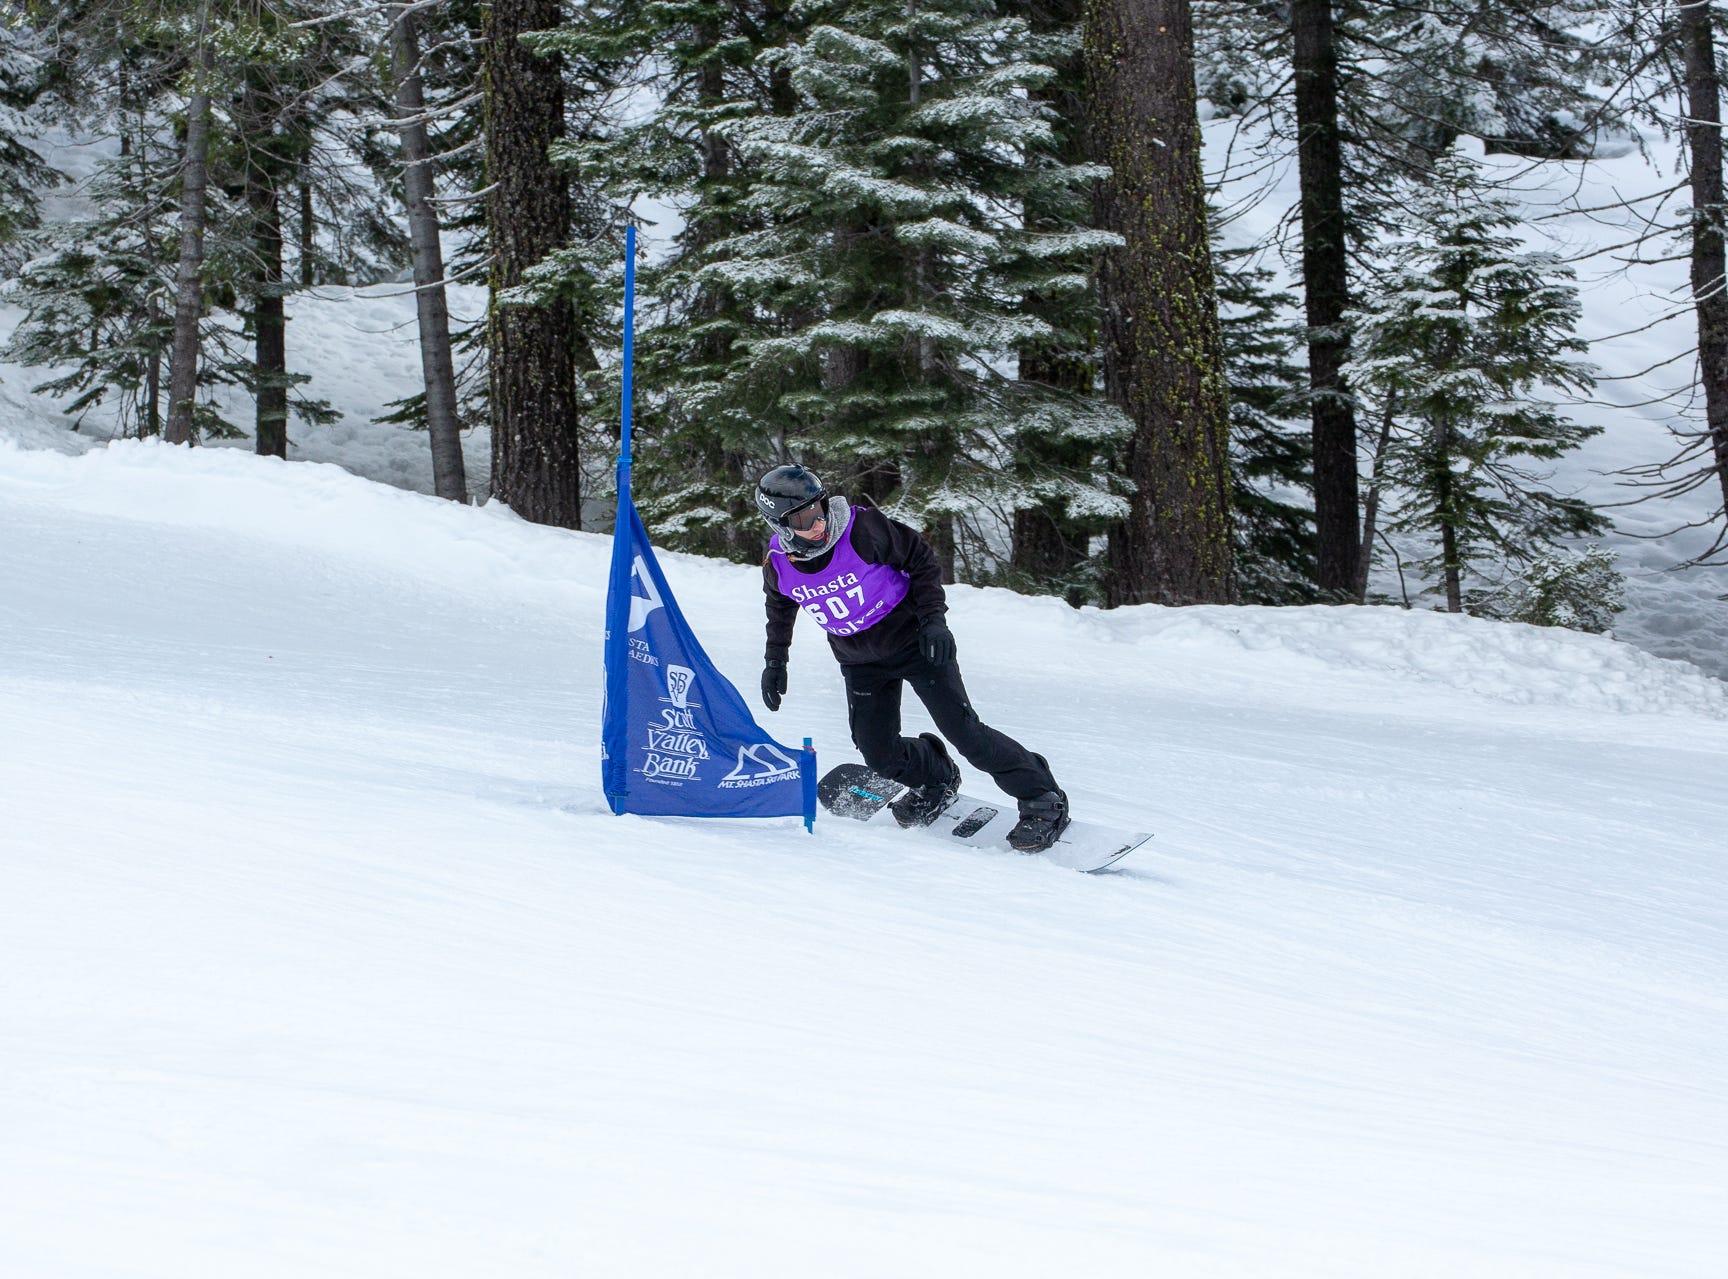 Joe Vericker of Shasta competes in the second high school snowboard meet of 2019 on Monday, Jan. 21 at Mt. Shasta Ski Park.